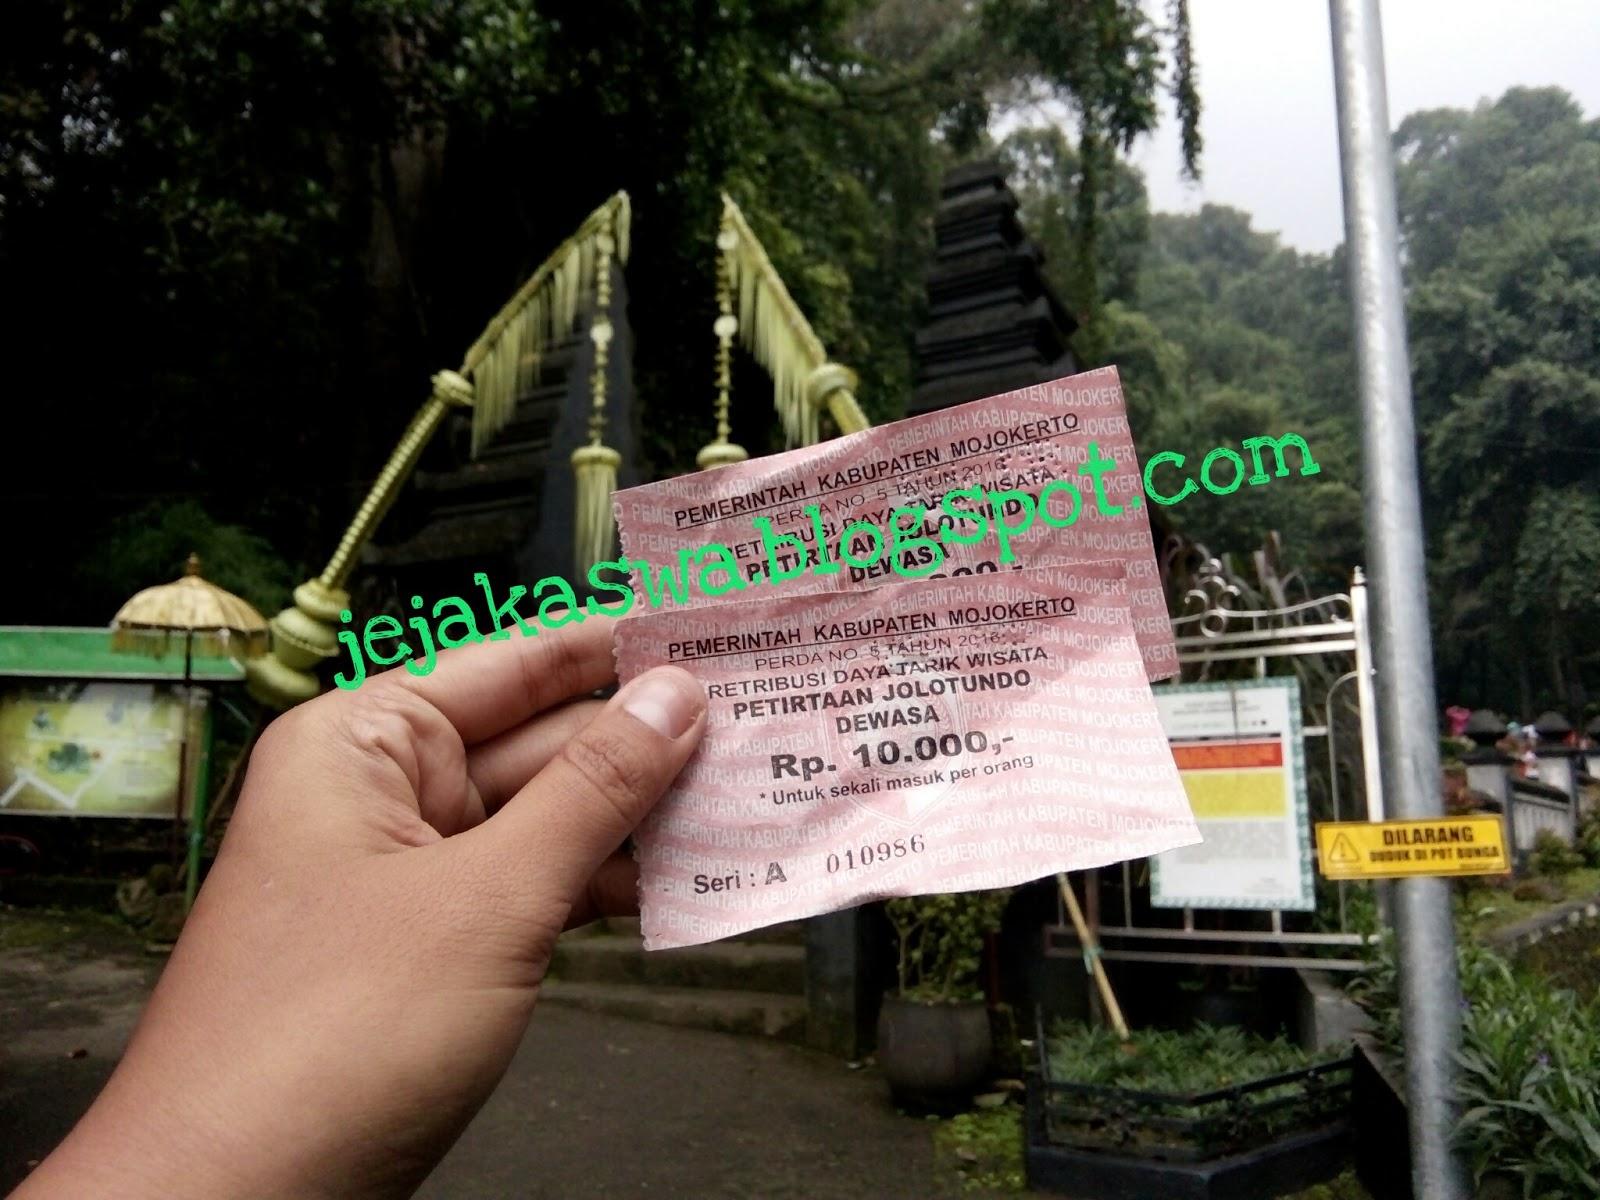 Liburan Singkat Candi Jolotundo Petilasan Maha Patih Narotama Kab Mojokerto